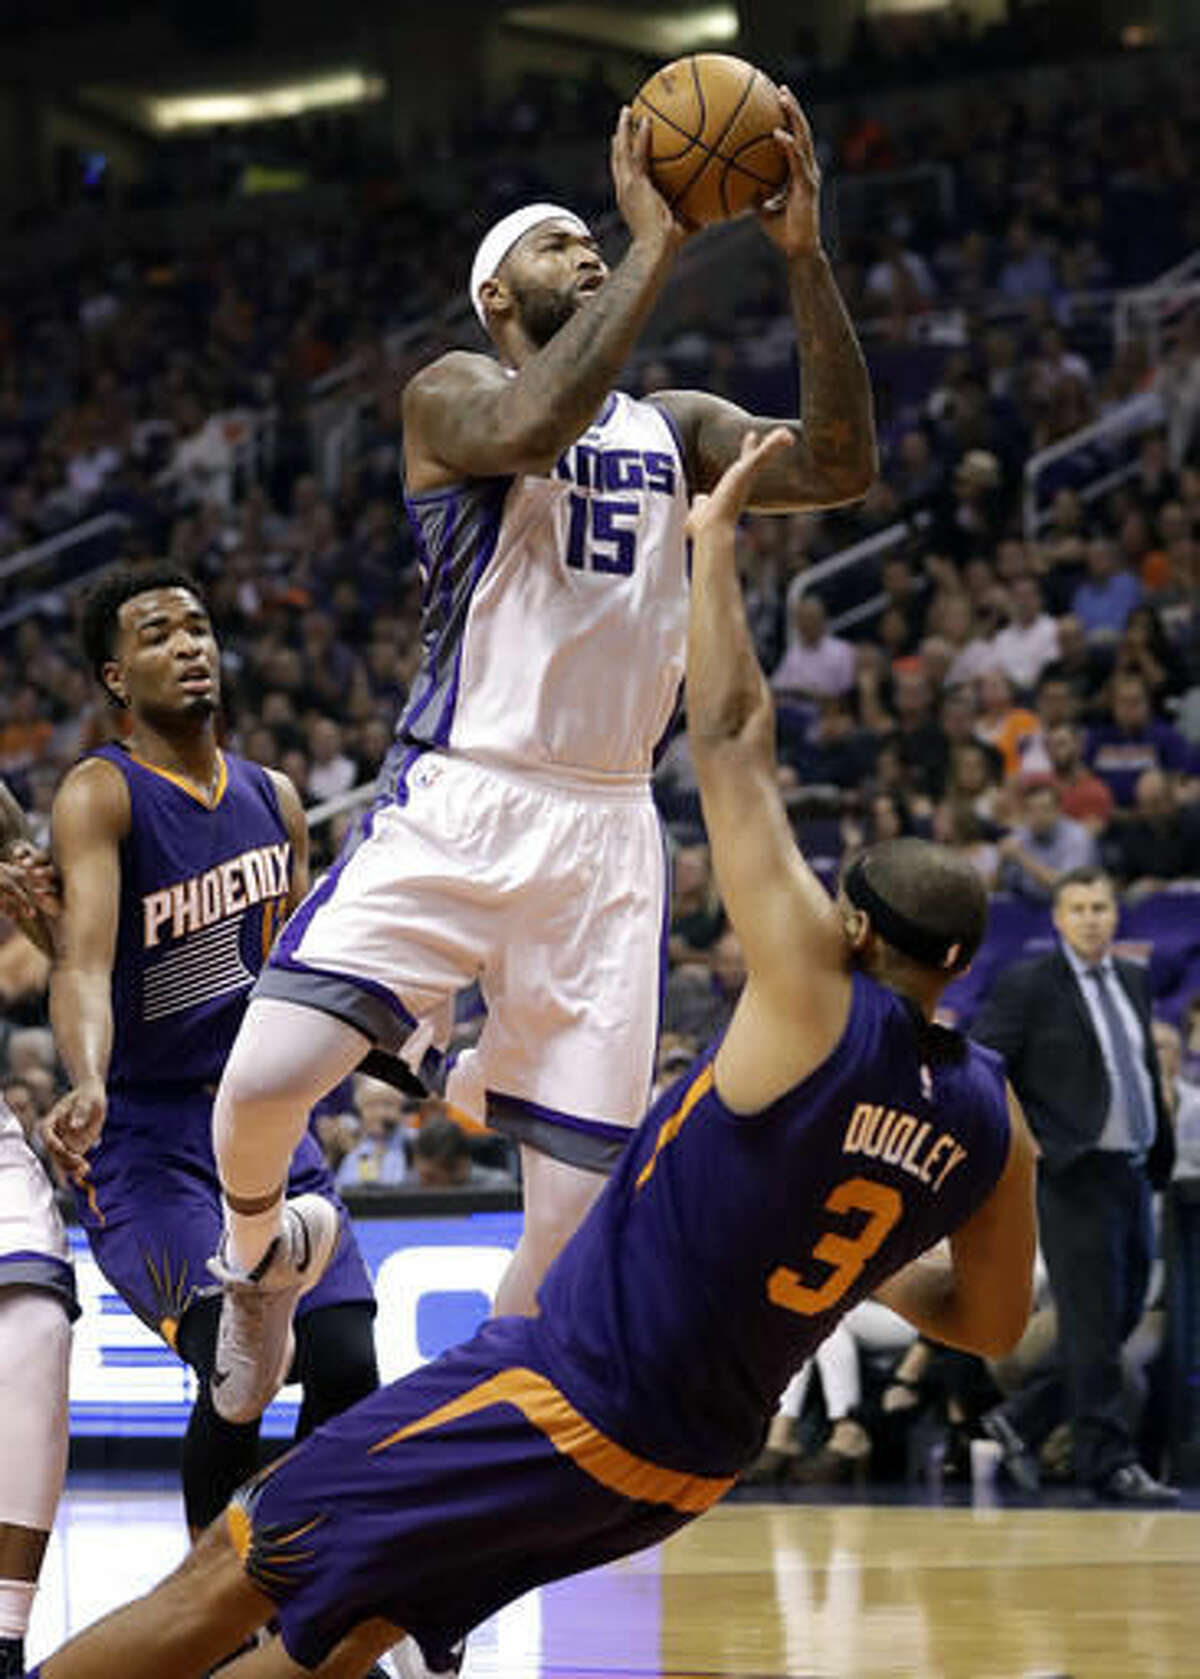 Sacramento Kings center DeMarcus Cousins (15) fouls Phoenix Suns forward Jared Dudley (3) during the first half of an NBA basketball game, Wednesday, Oct. 26, 2016, in Phoenix. (AP Photo/Matt York)